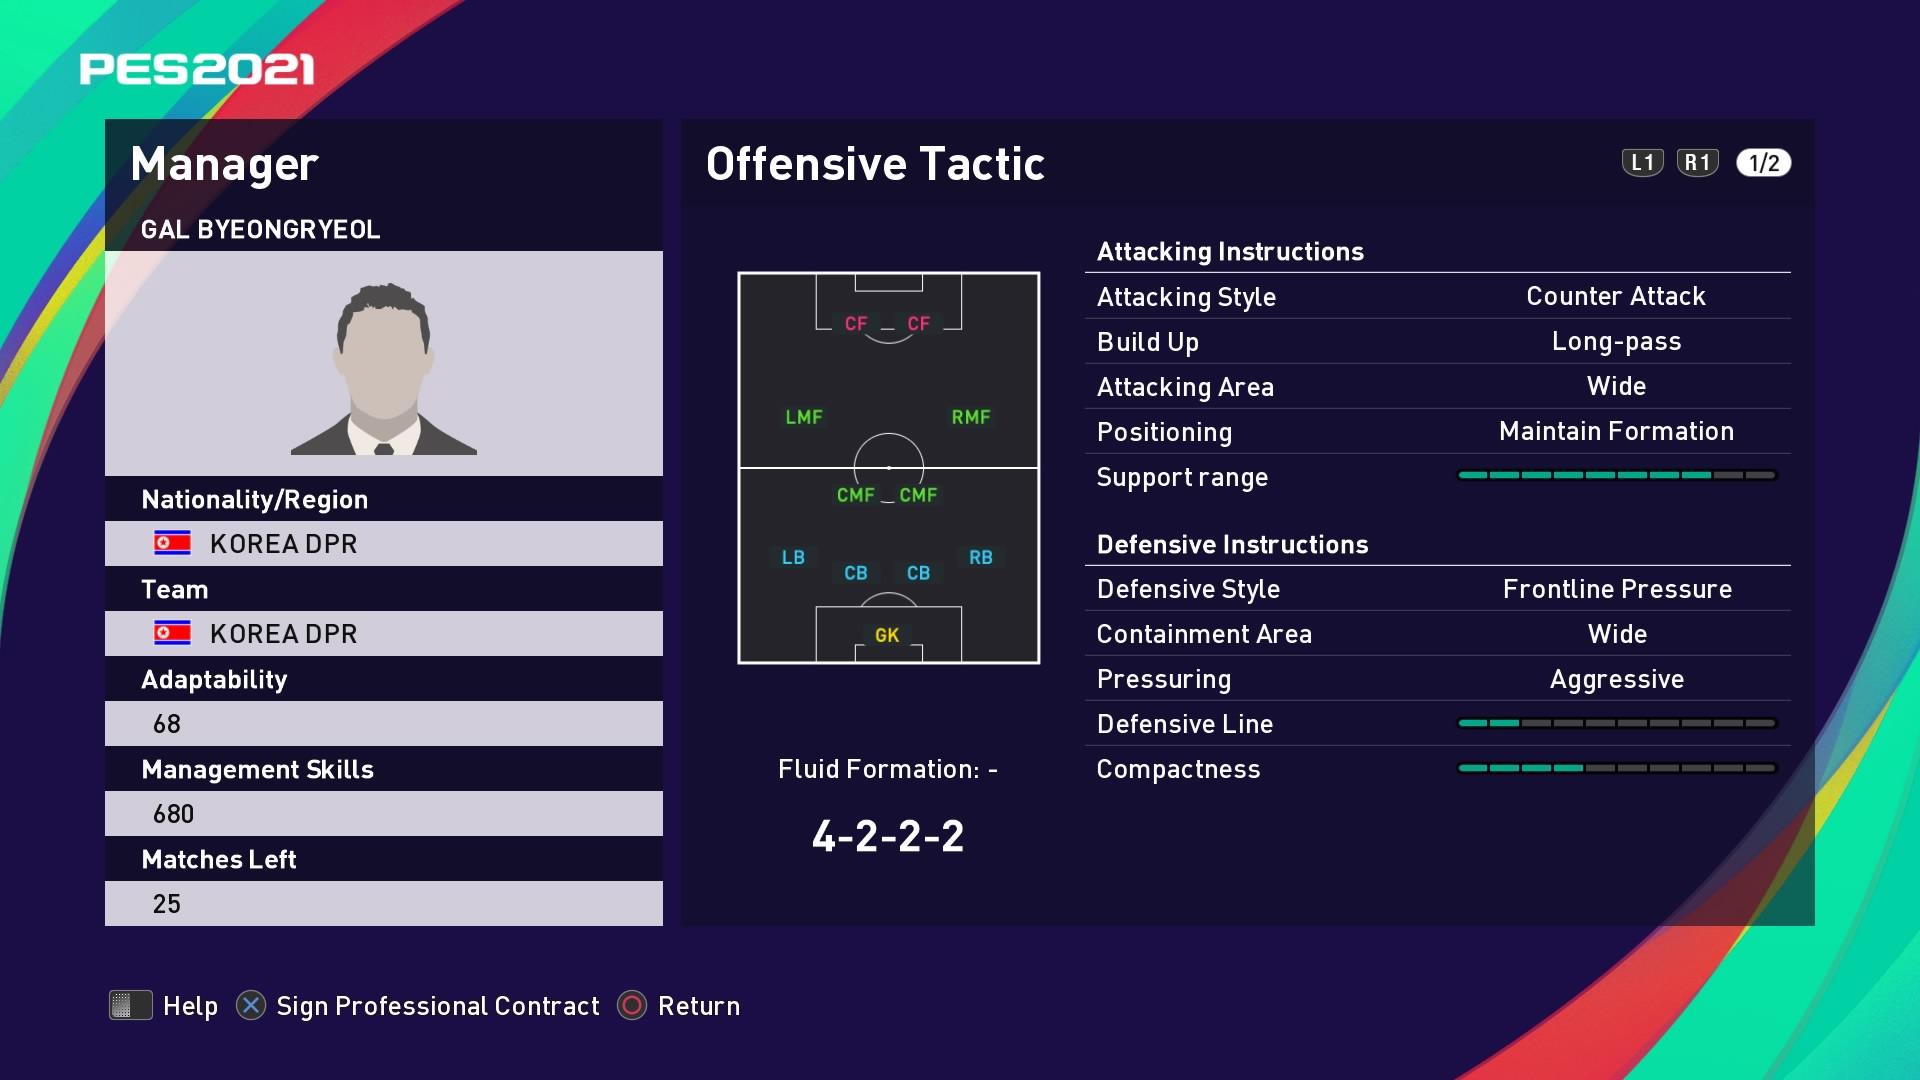 Gal Byeongryeol (Yun Jong-su) Offensive Tactic in PES 2021 myClub